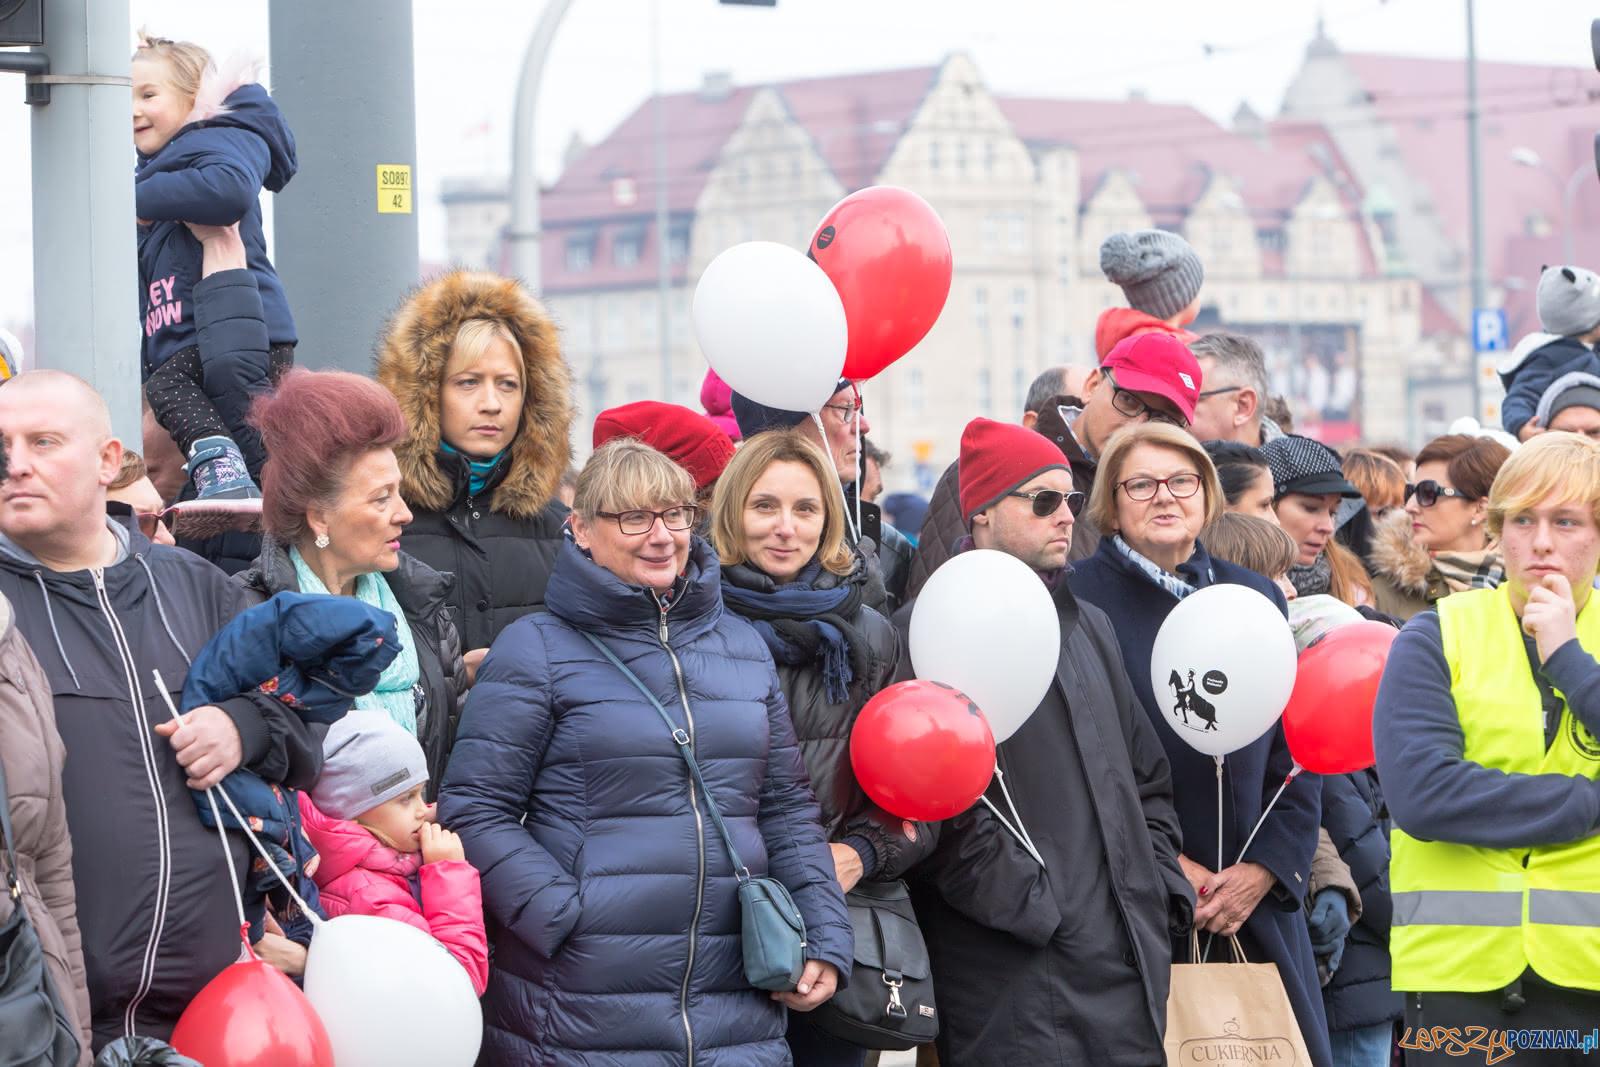 Popchód św. Marcina  Foto: lepszyPOZNAN.pl/Piotr Rychter